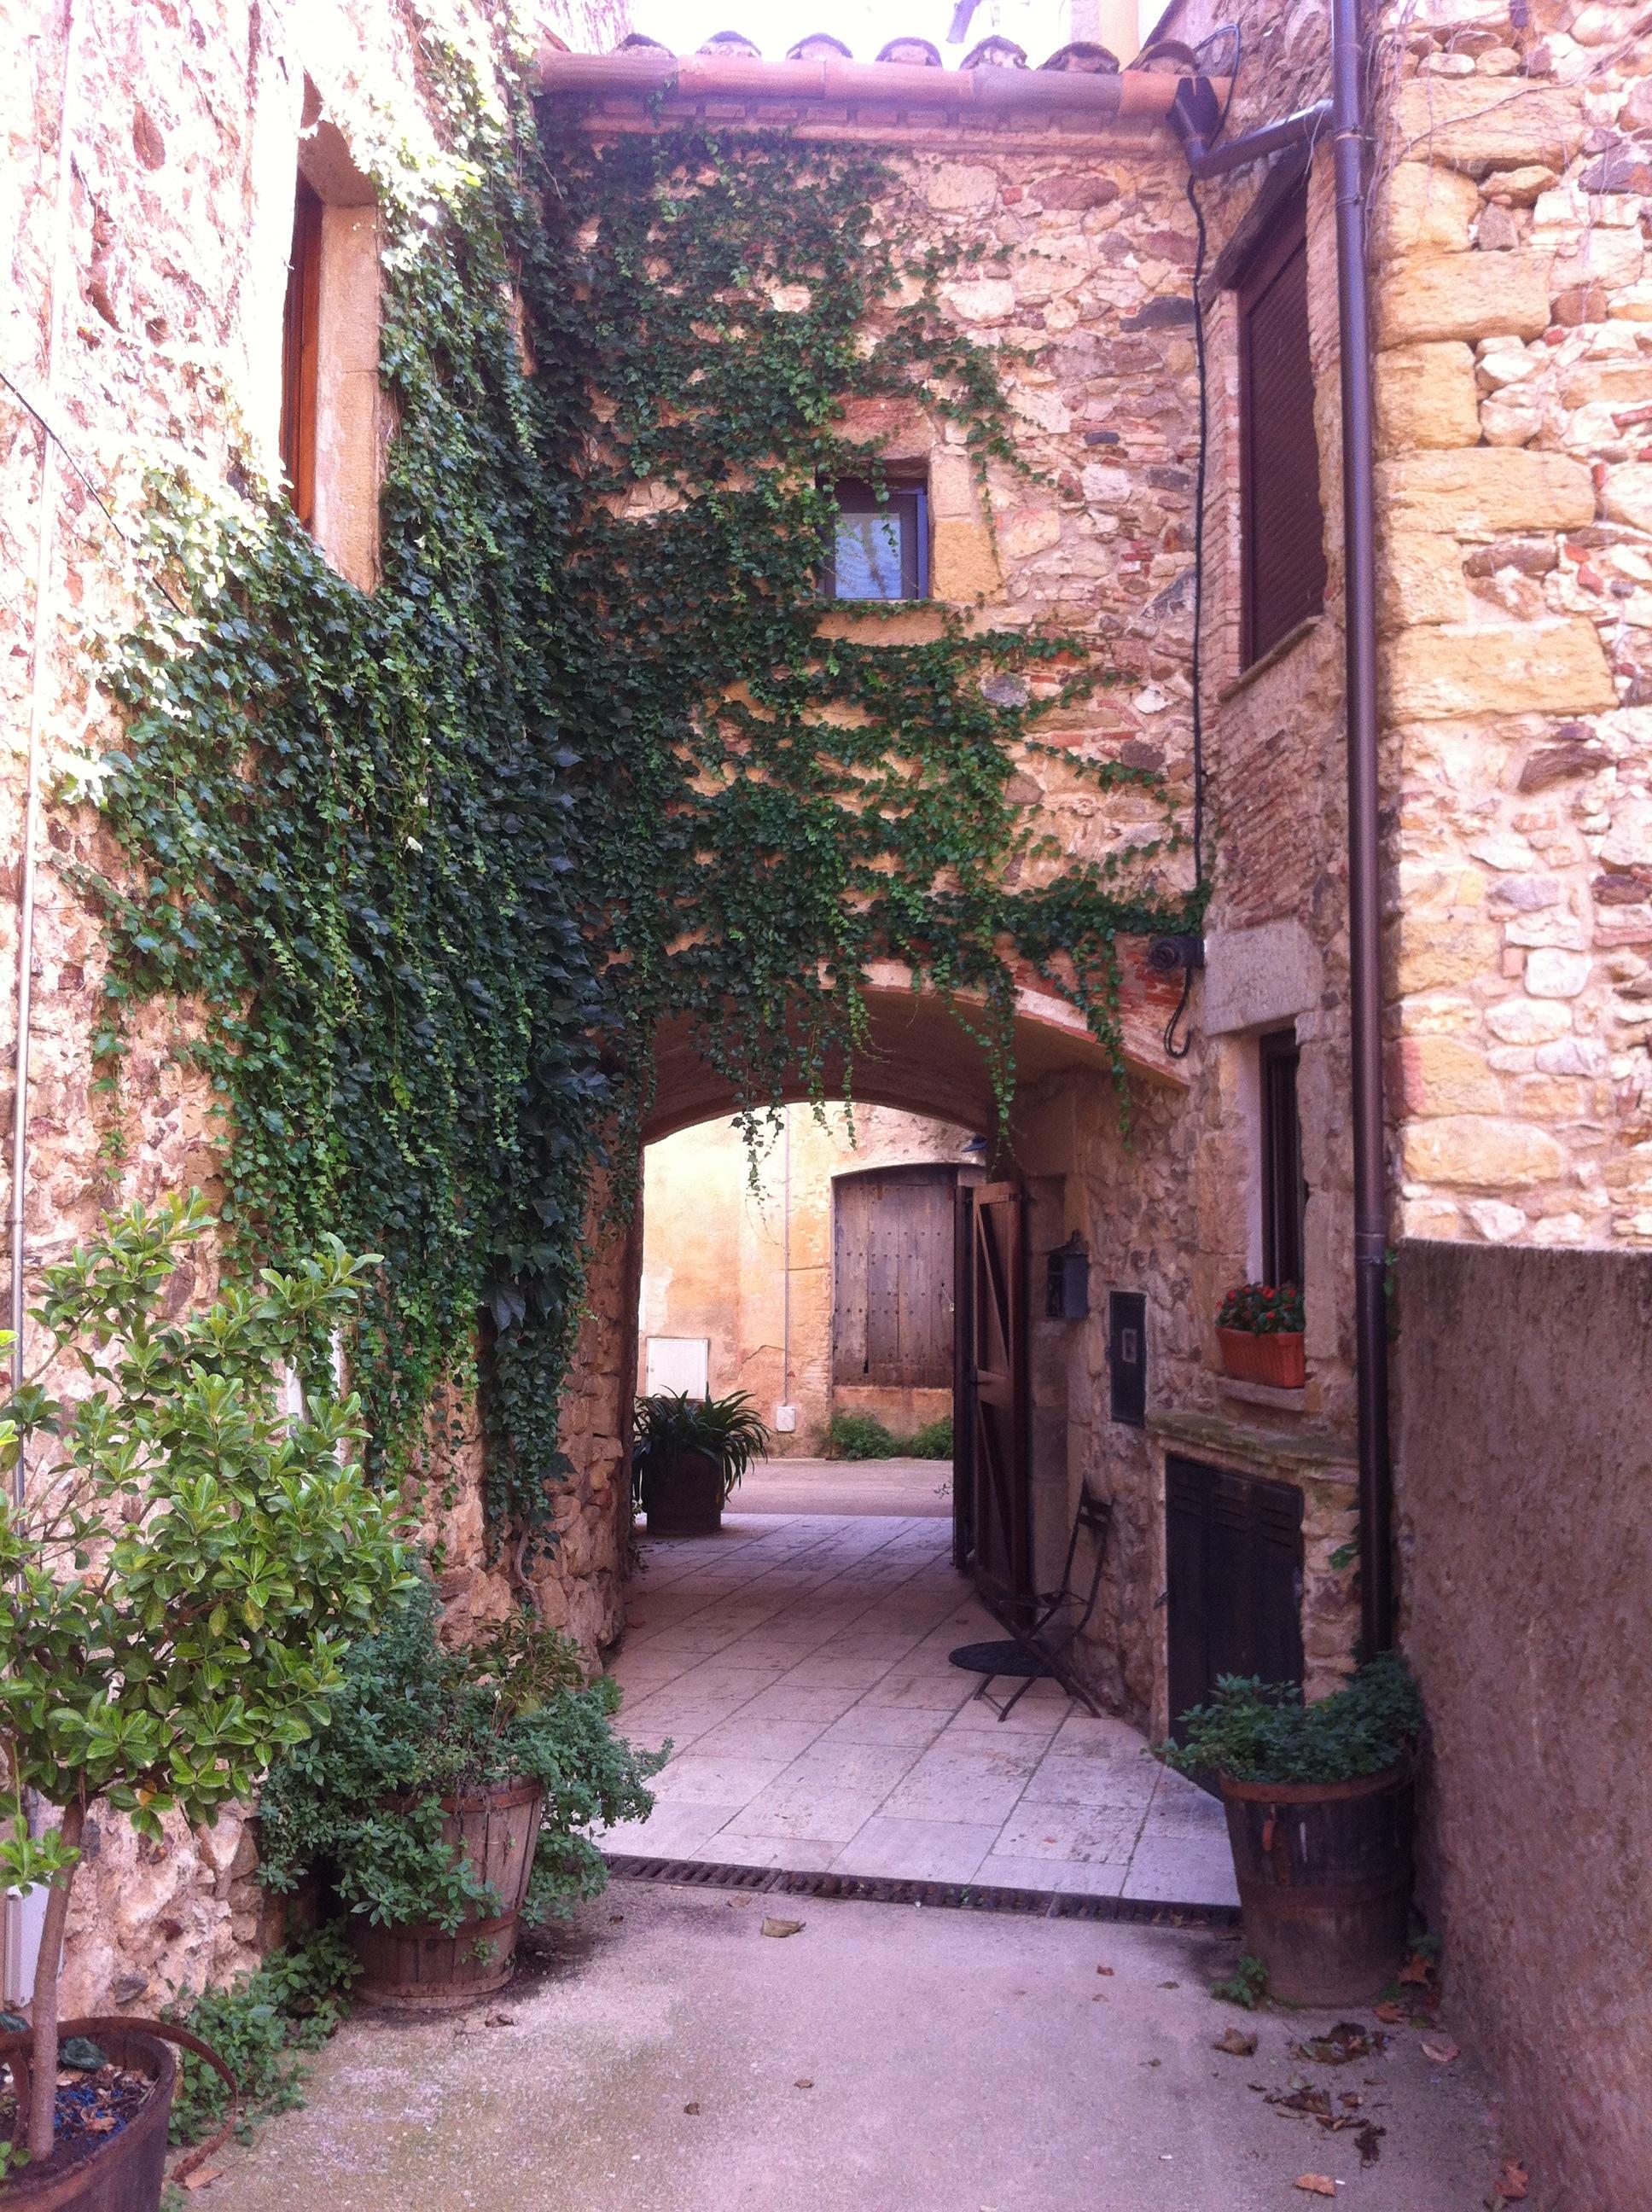 File 17118 Cruïlles Monells I Sant Sadurní De L Heura Girona Spain Panoramio 8 Jpg Wikimedia Commons